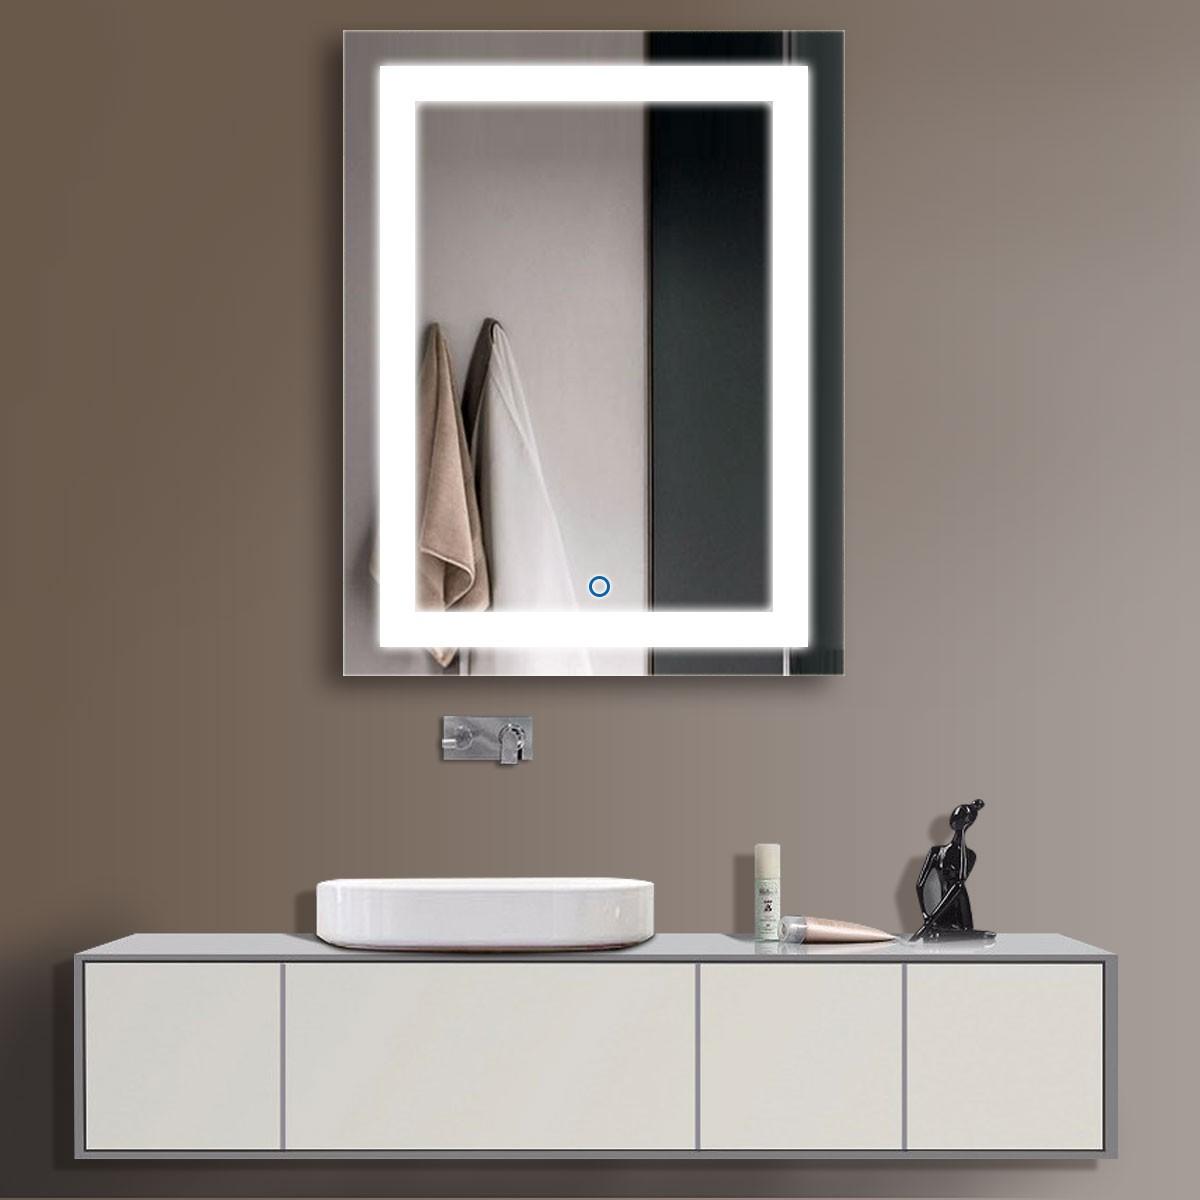 28 x 36 po miroir vertical argent led salle de bains avec interrupteur tactile dk od ck168 i. Black Bedroom Furniture Sets. Home Design Ideas